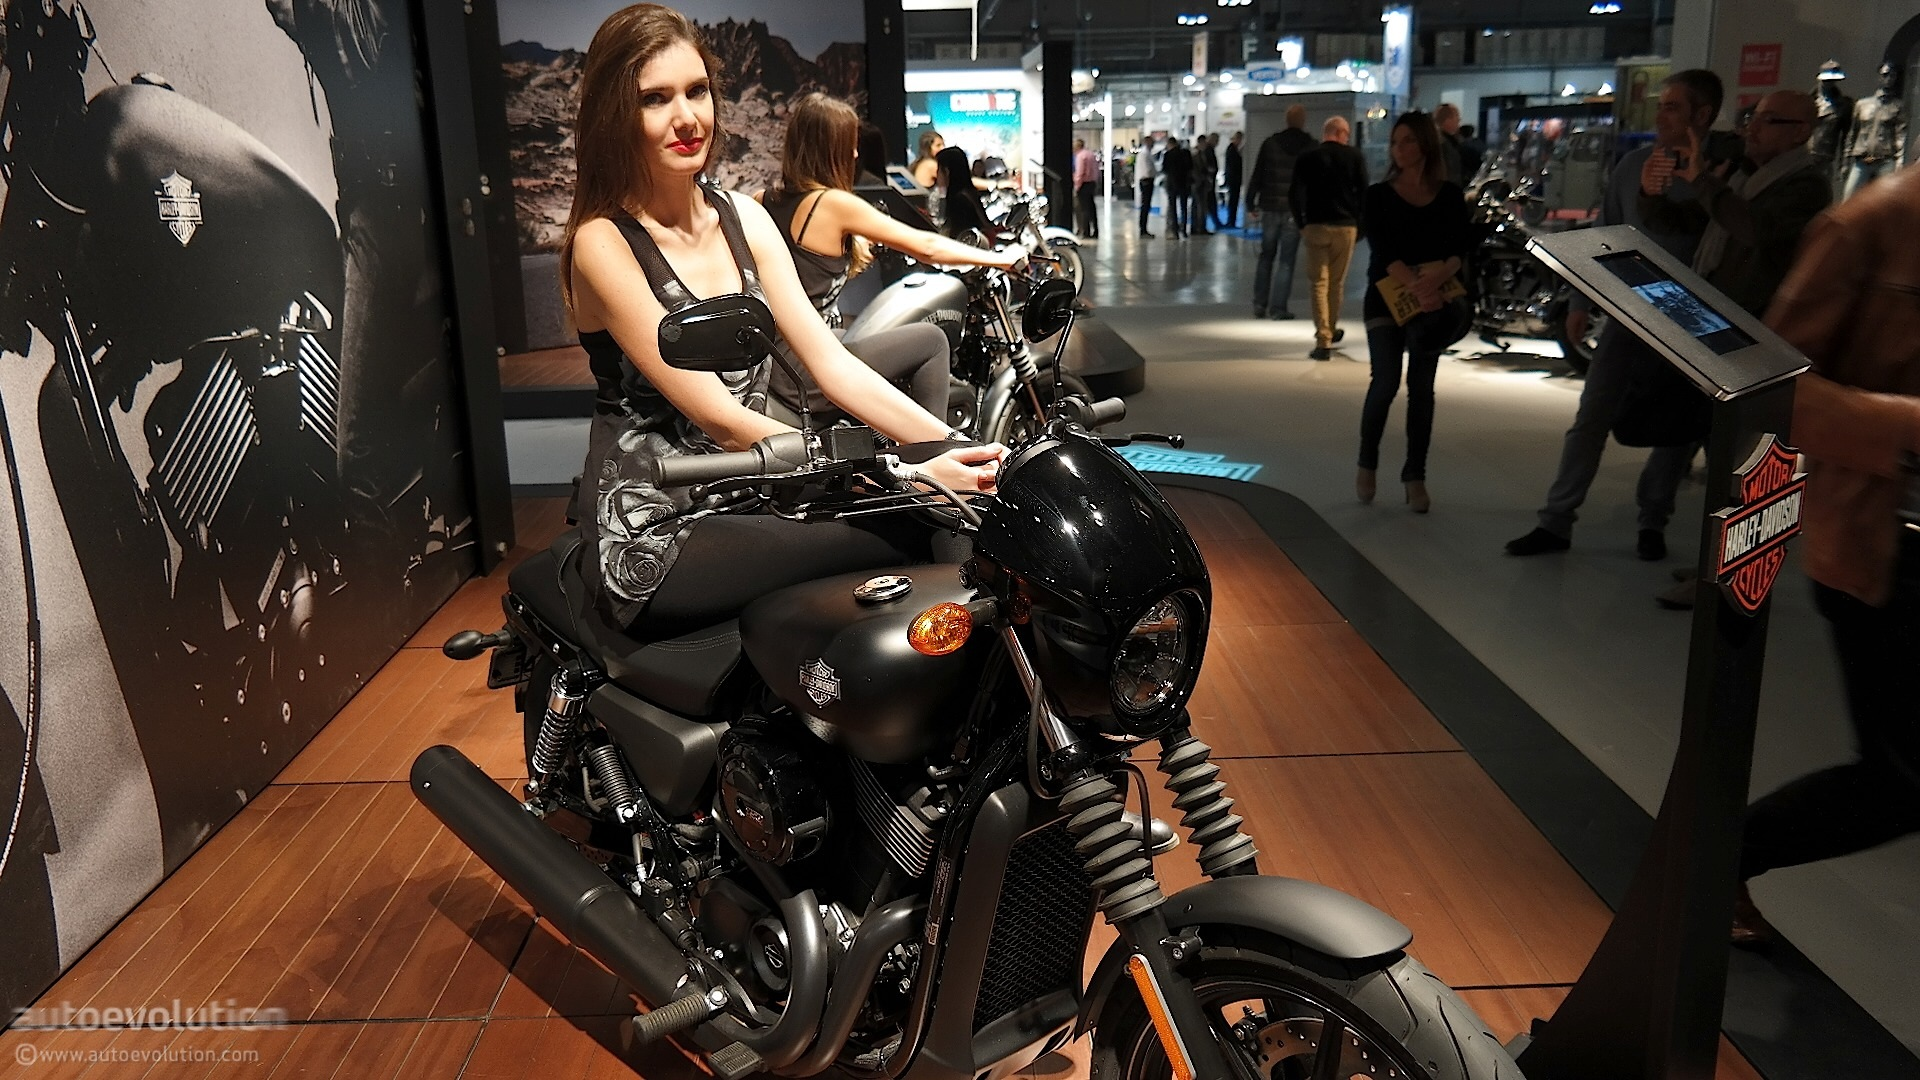 Street Bike Girl Wallpapers 2015 Harley Davidson Street 750 Is A Bit Rough Around The